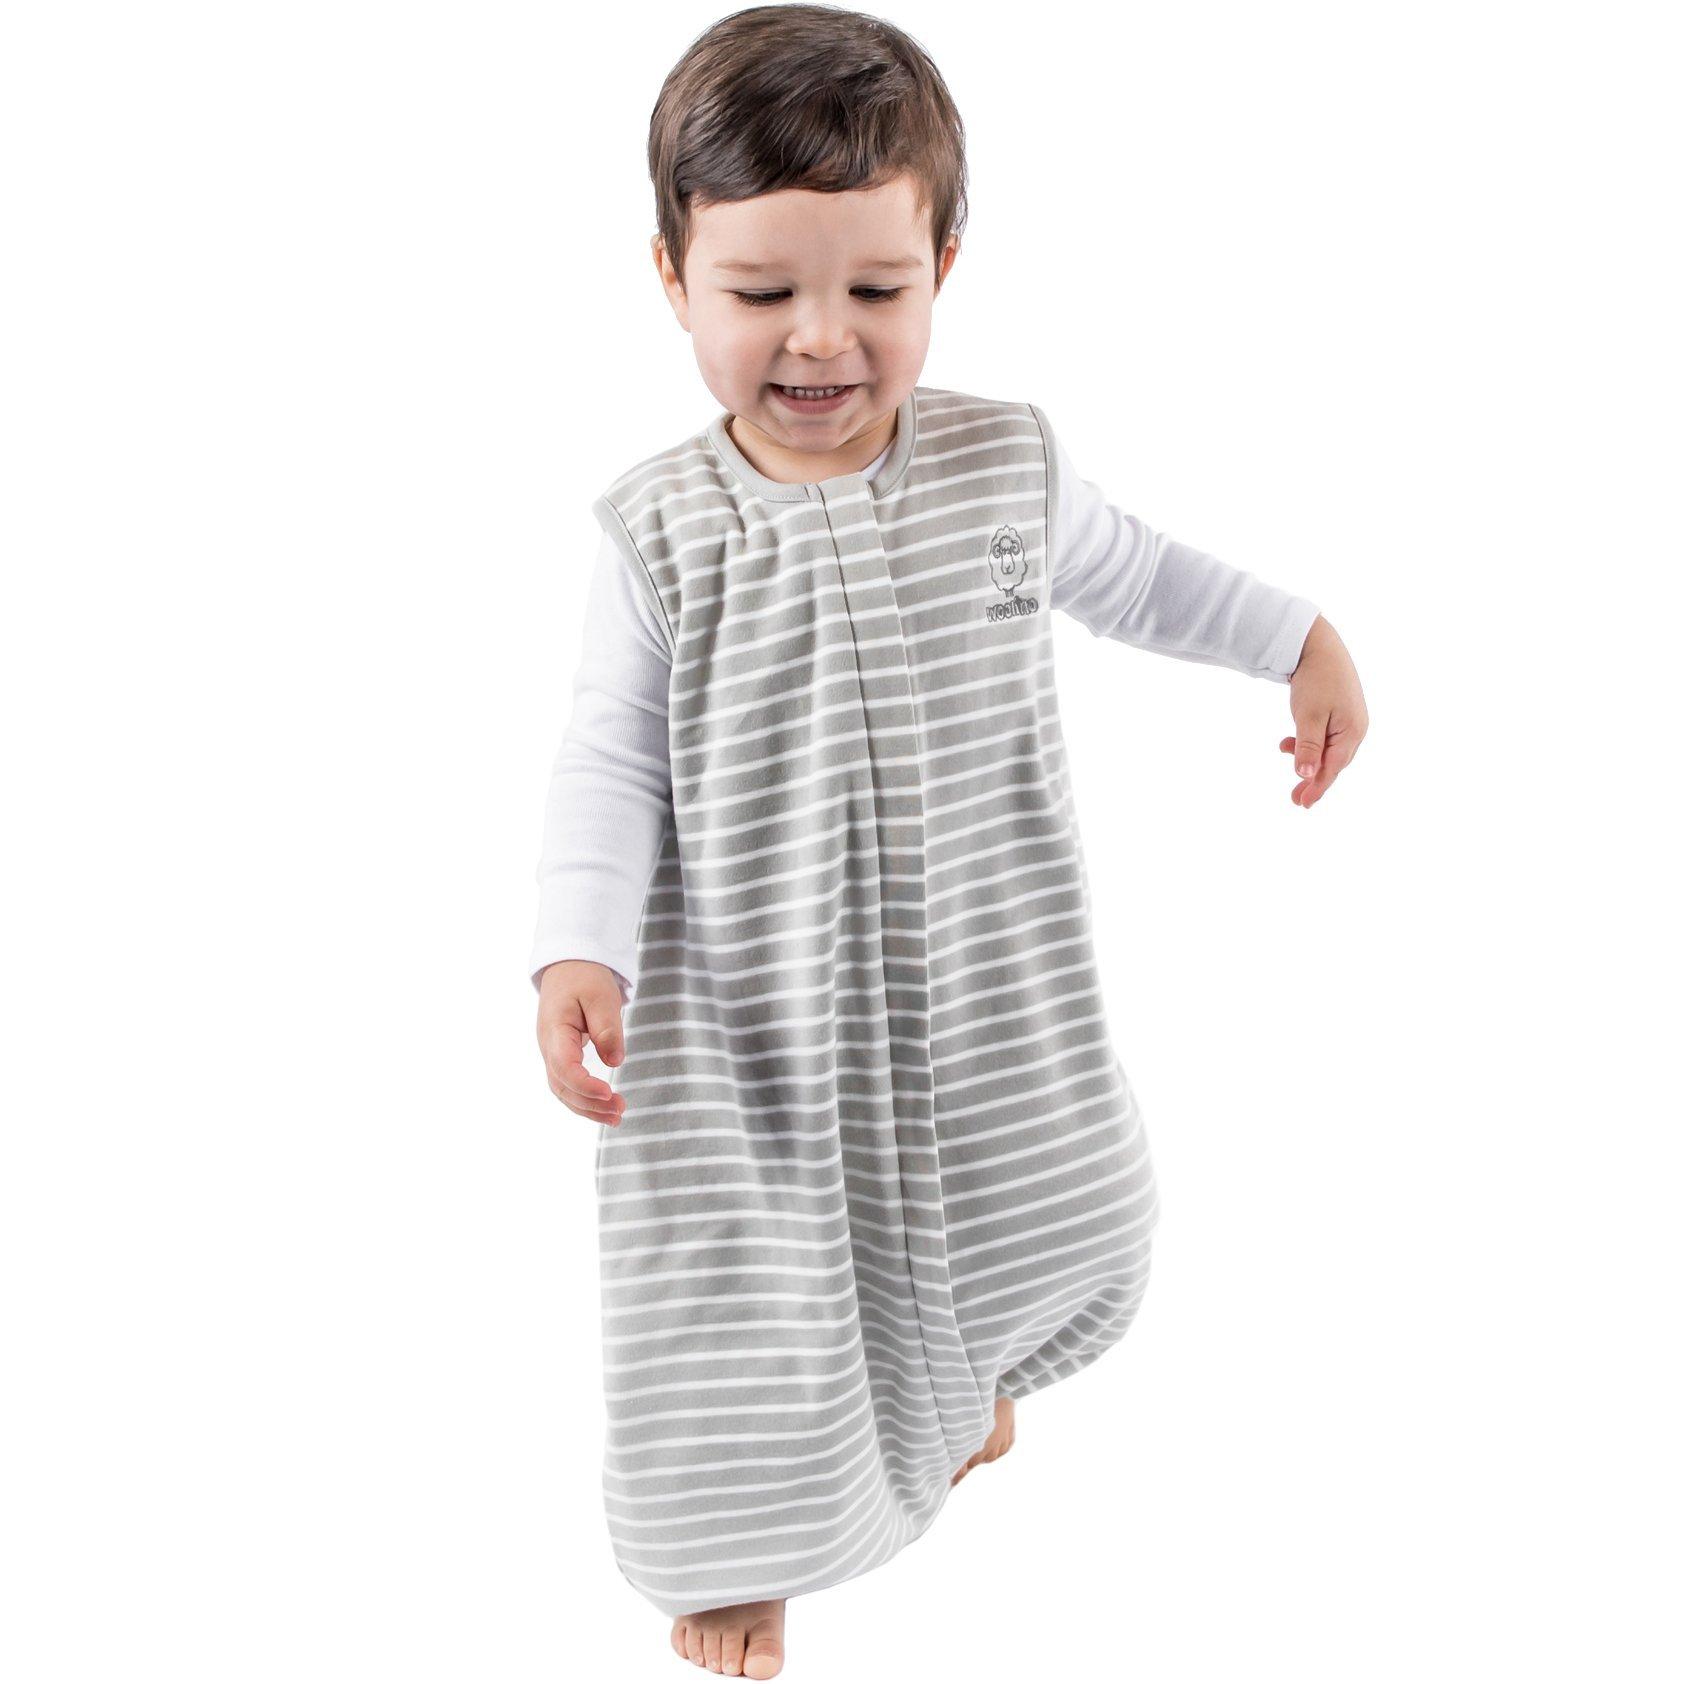 Woolino 4 Season Baby Sleep Bag with Feet, Merino Wool Walker Sleep Bag or Sack, 6-18m, Gray